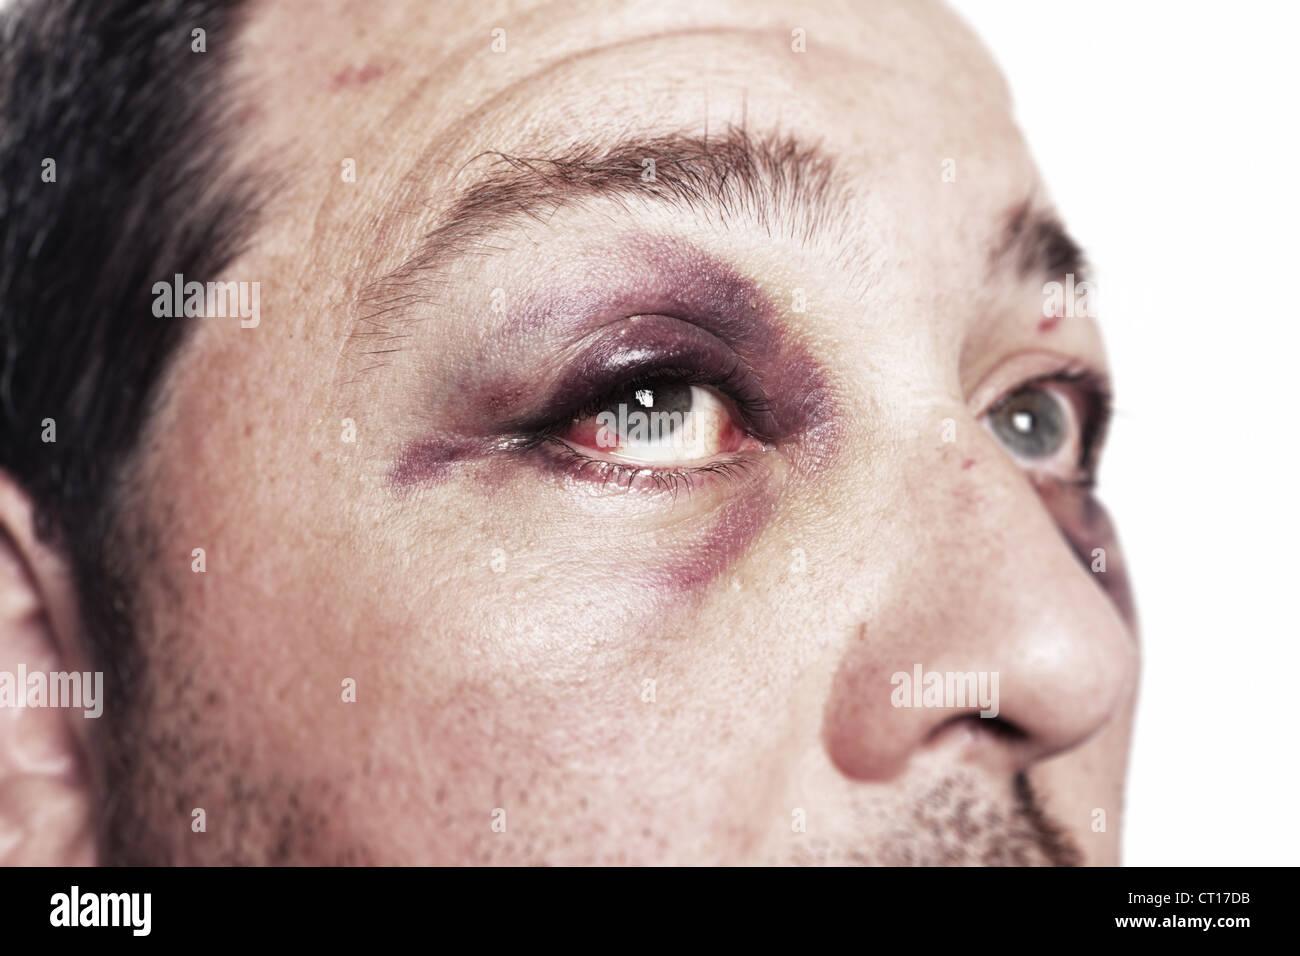 The Black Eye: Head or Face Contusion | Rothman ...